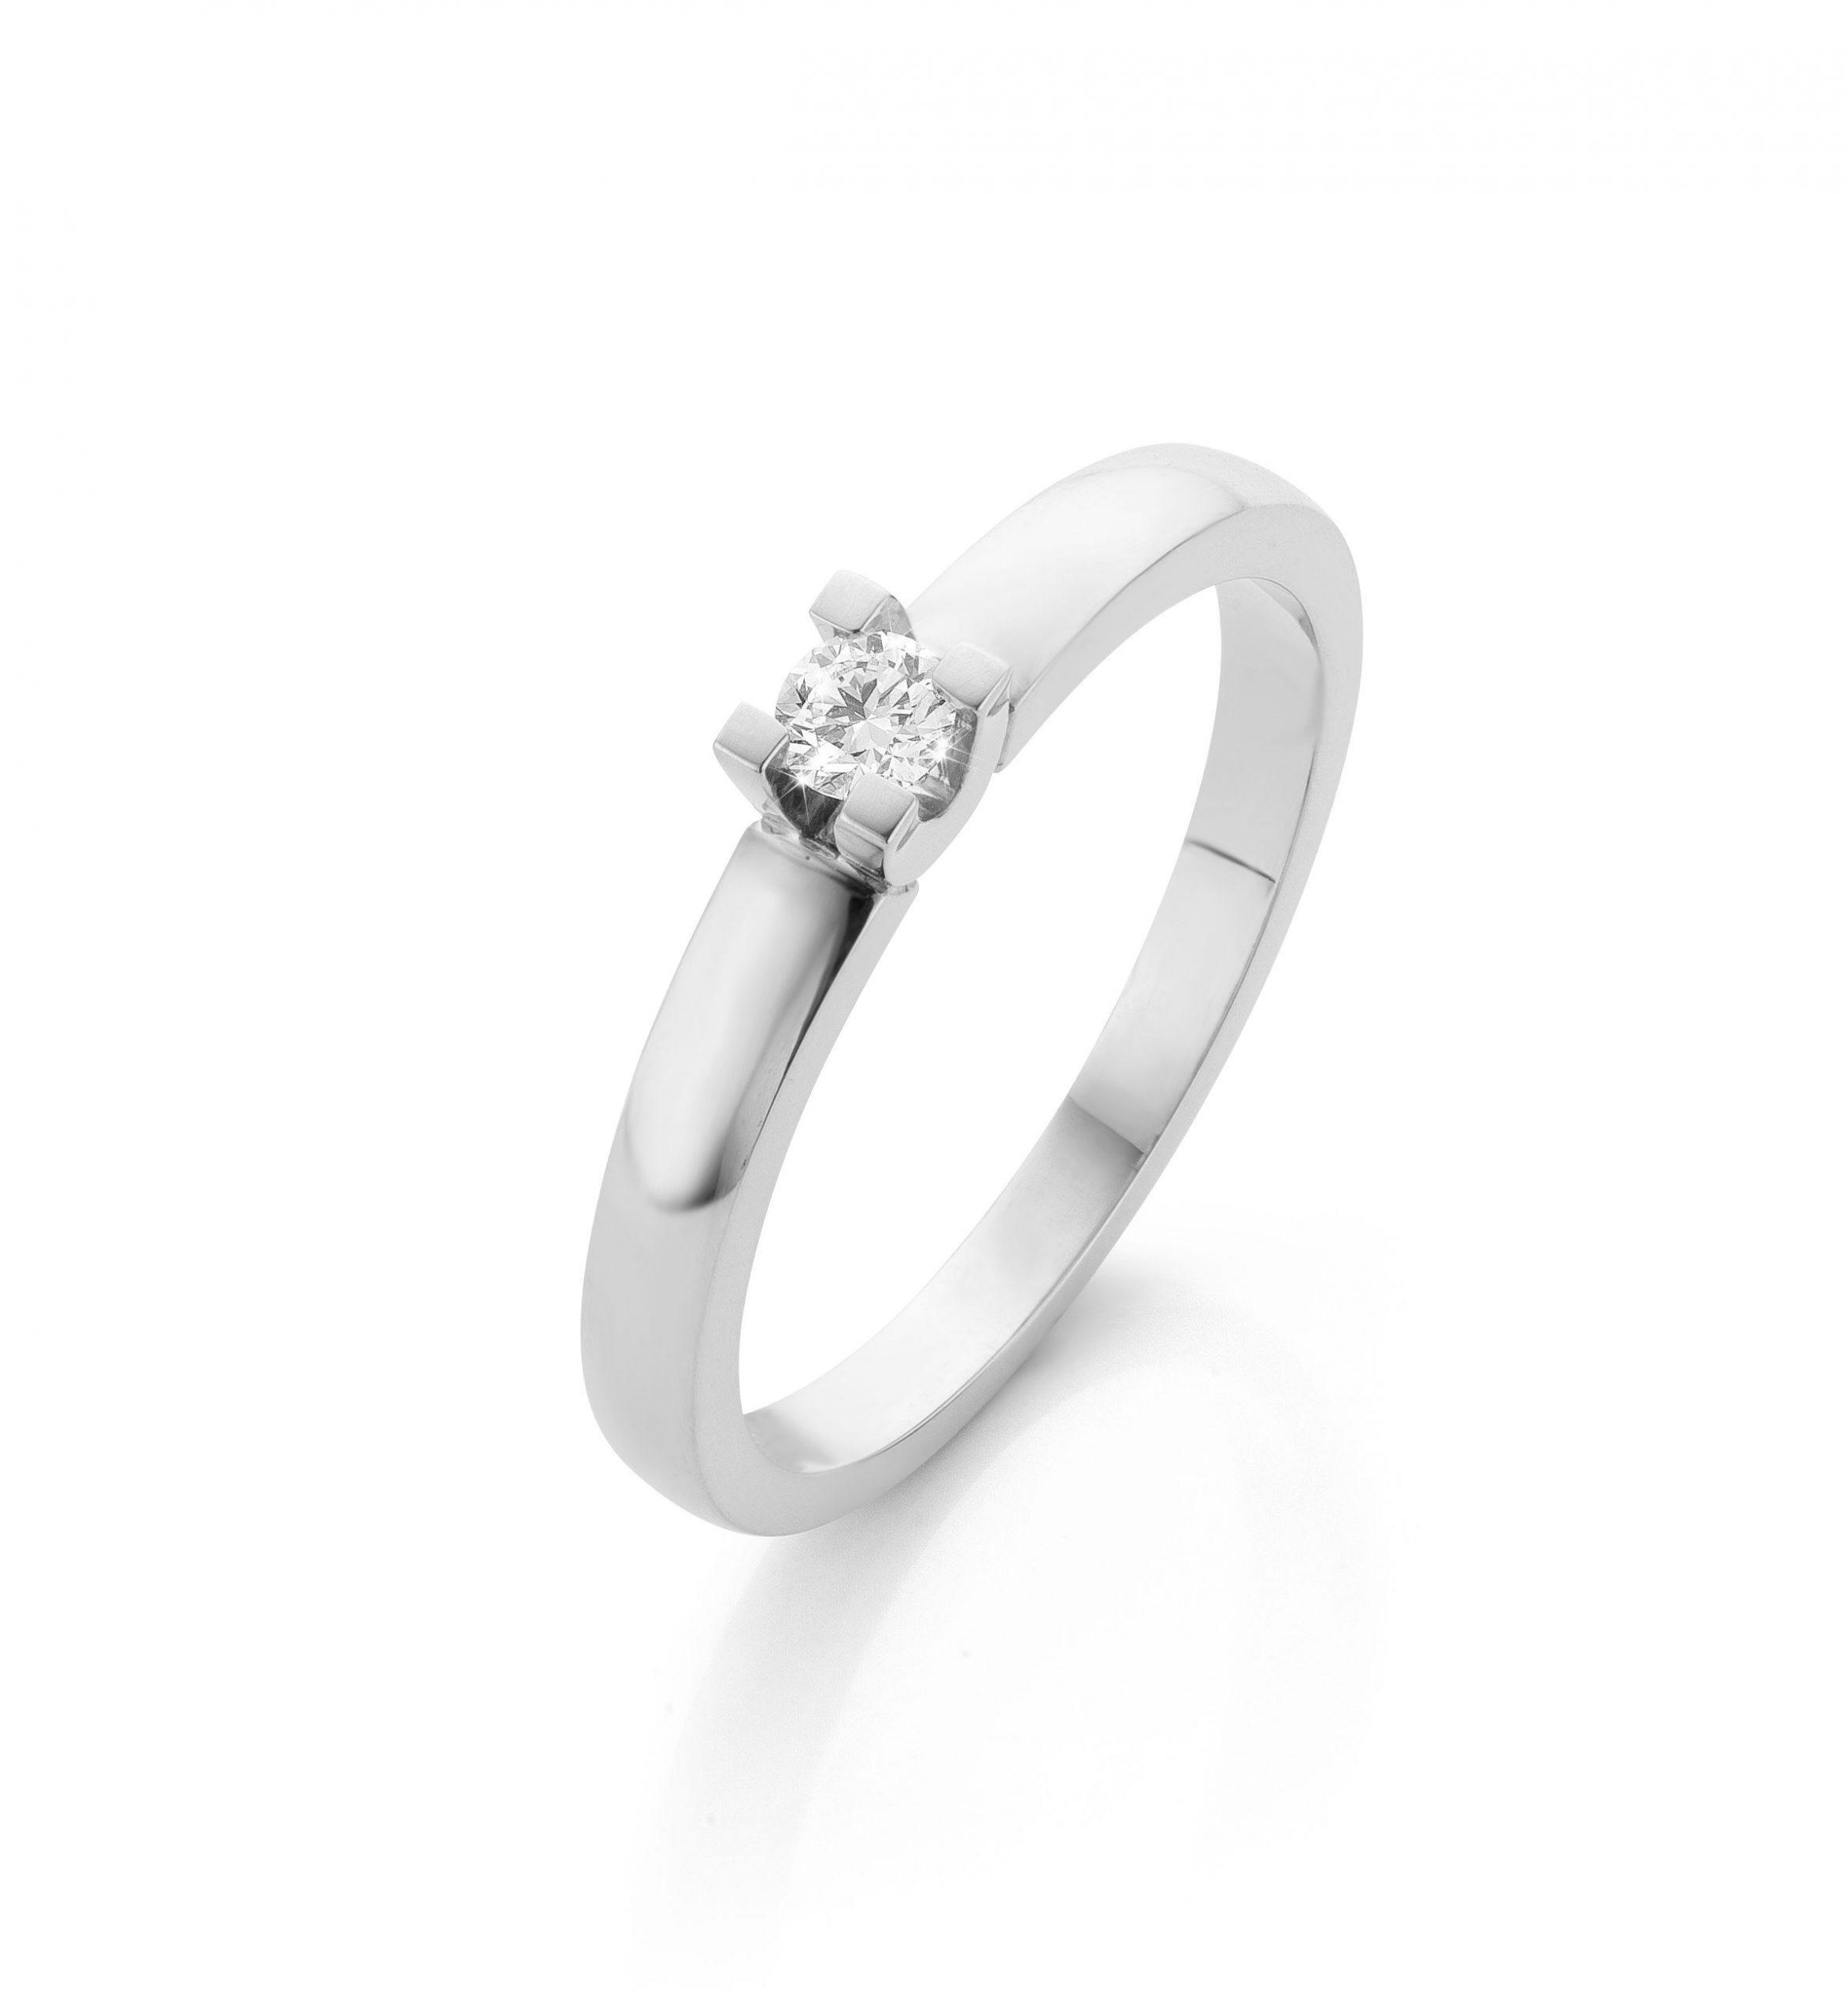 Witgouden verlovingsring met diamant